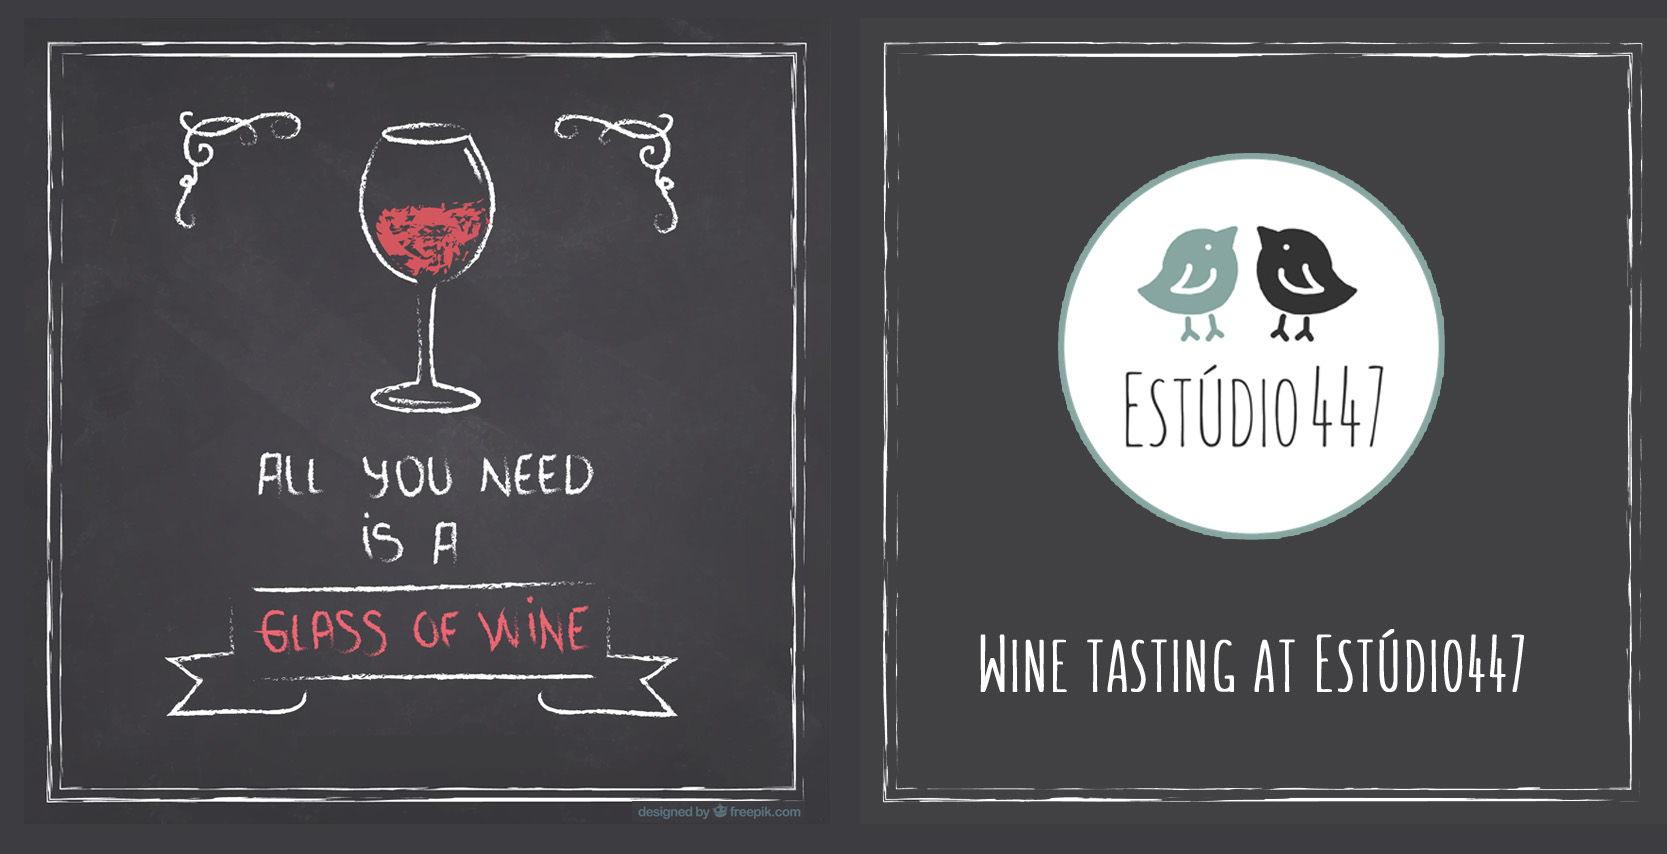 WINE TASTING AT ESTUDIO447 -glass.jpg